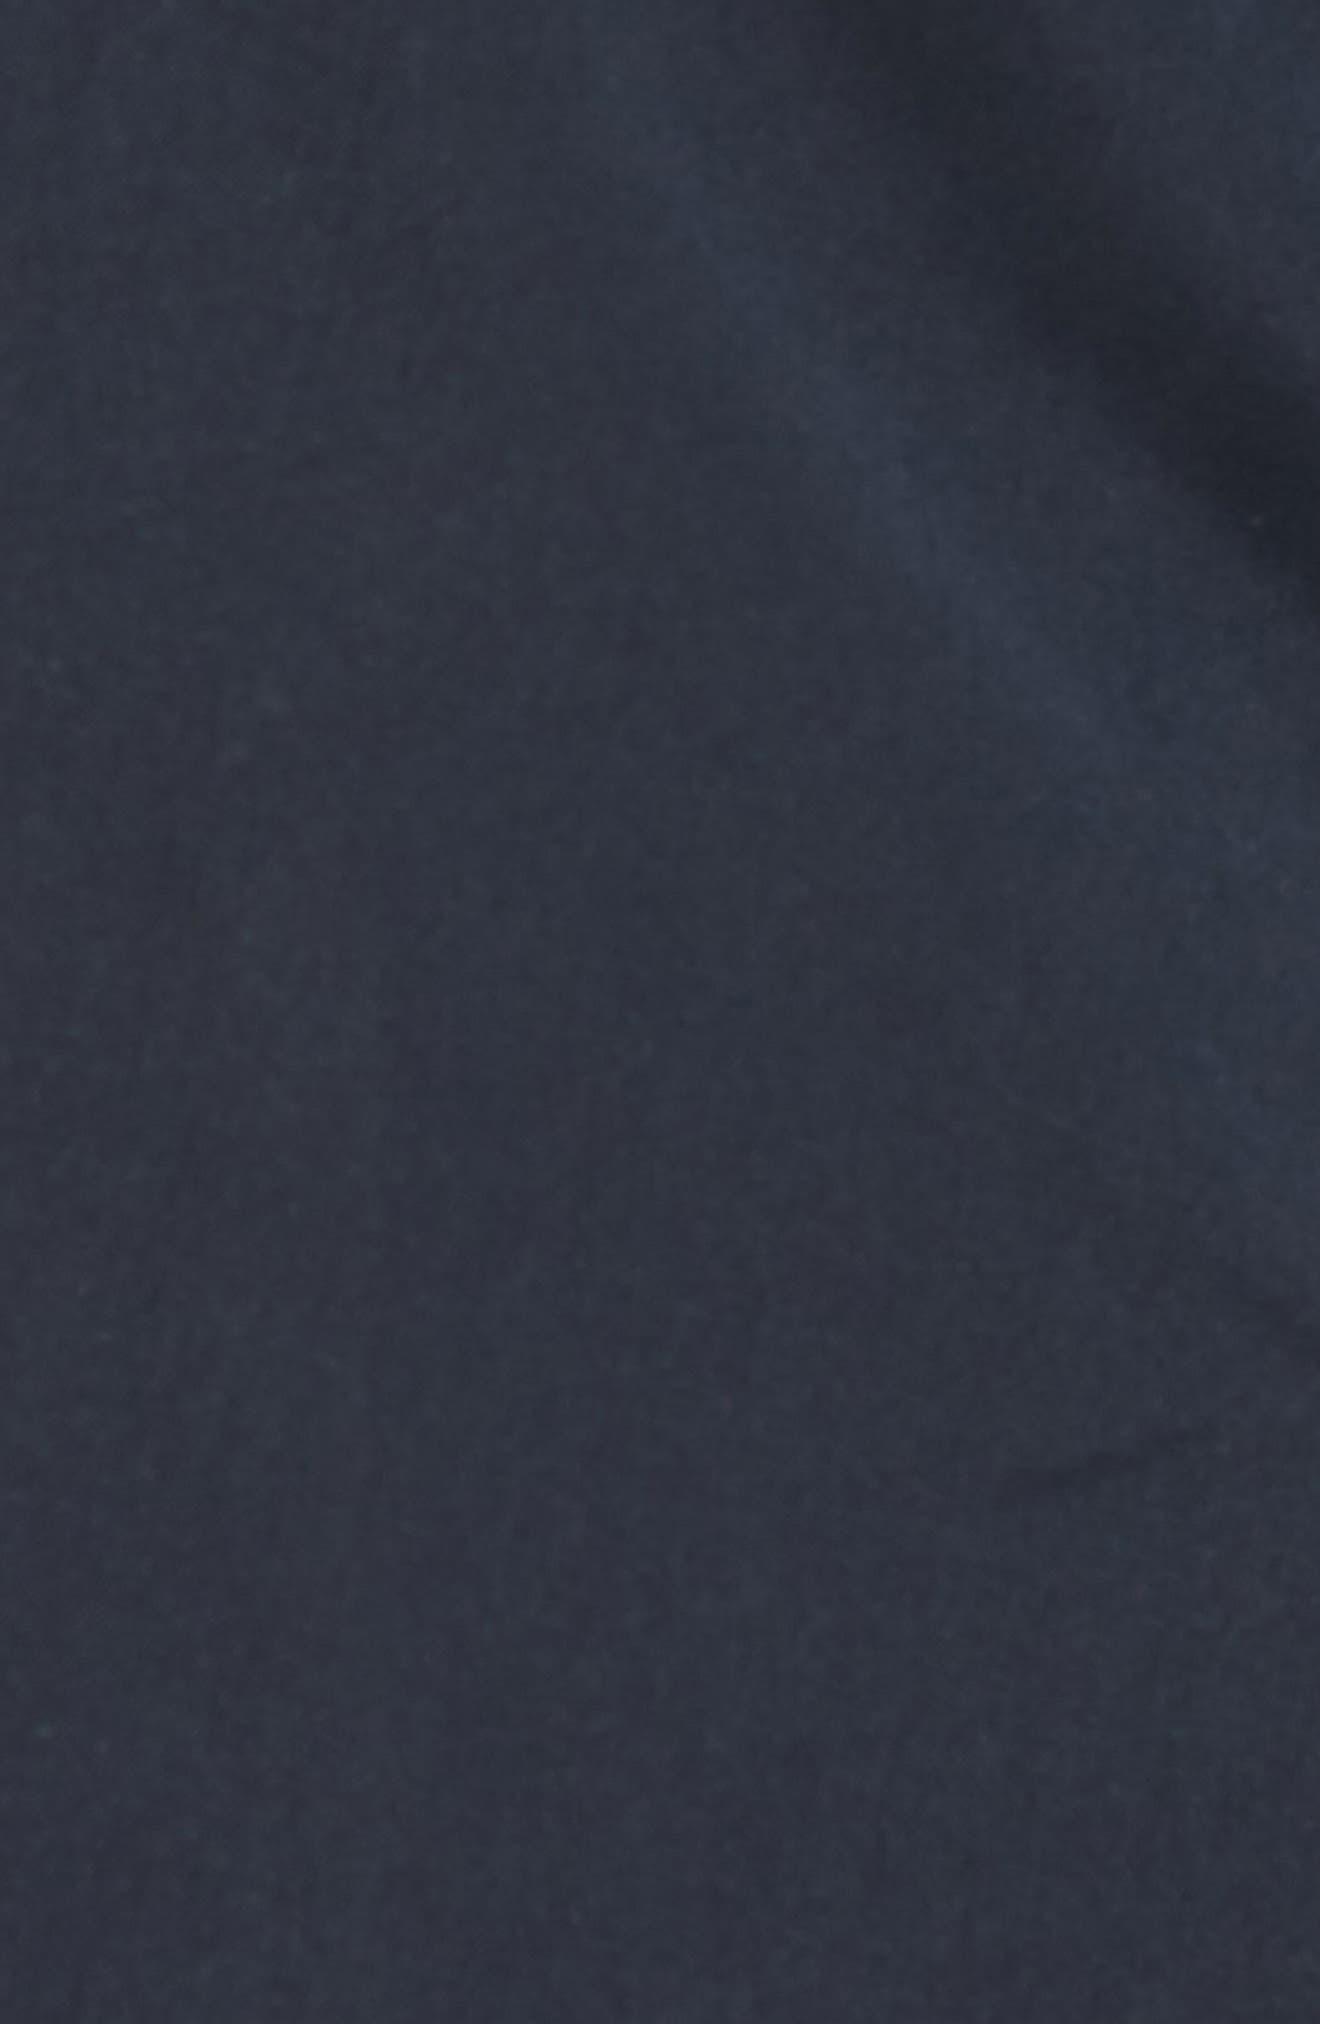 Marco Slim Fit Swim Trunks,                             Alternate thumbnail 4, color,                             Marine Blue